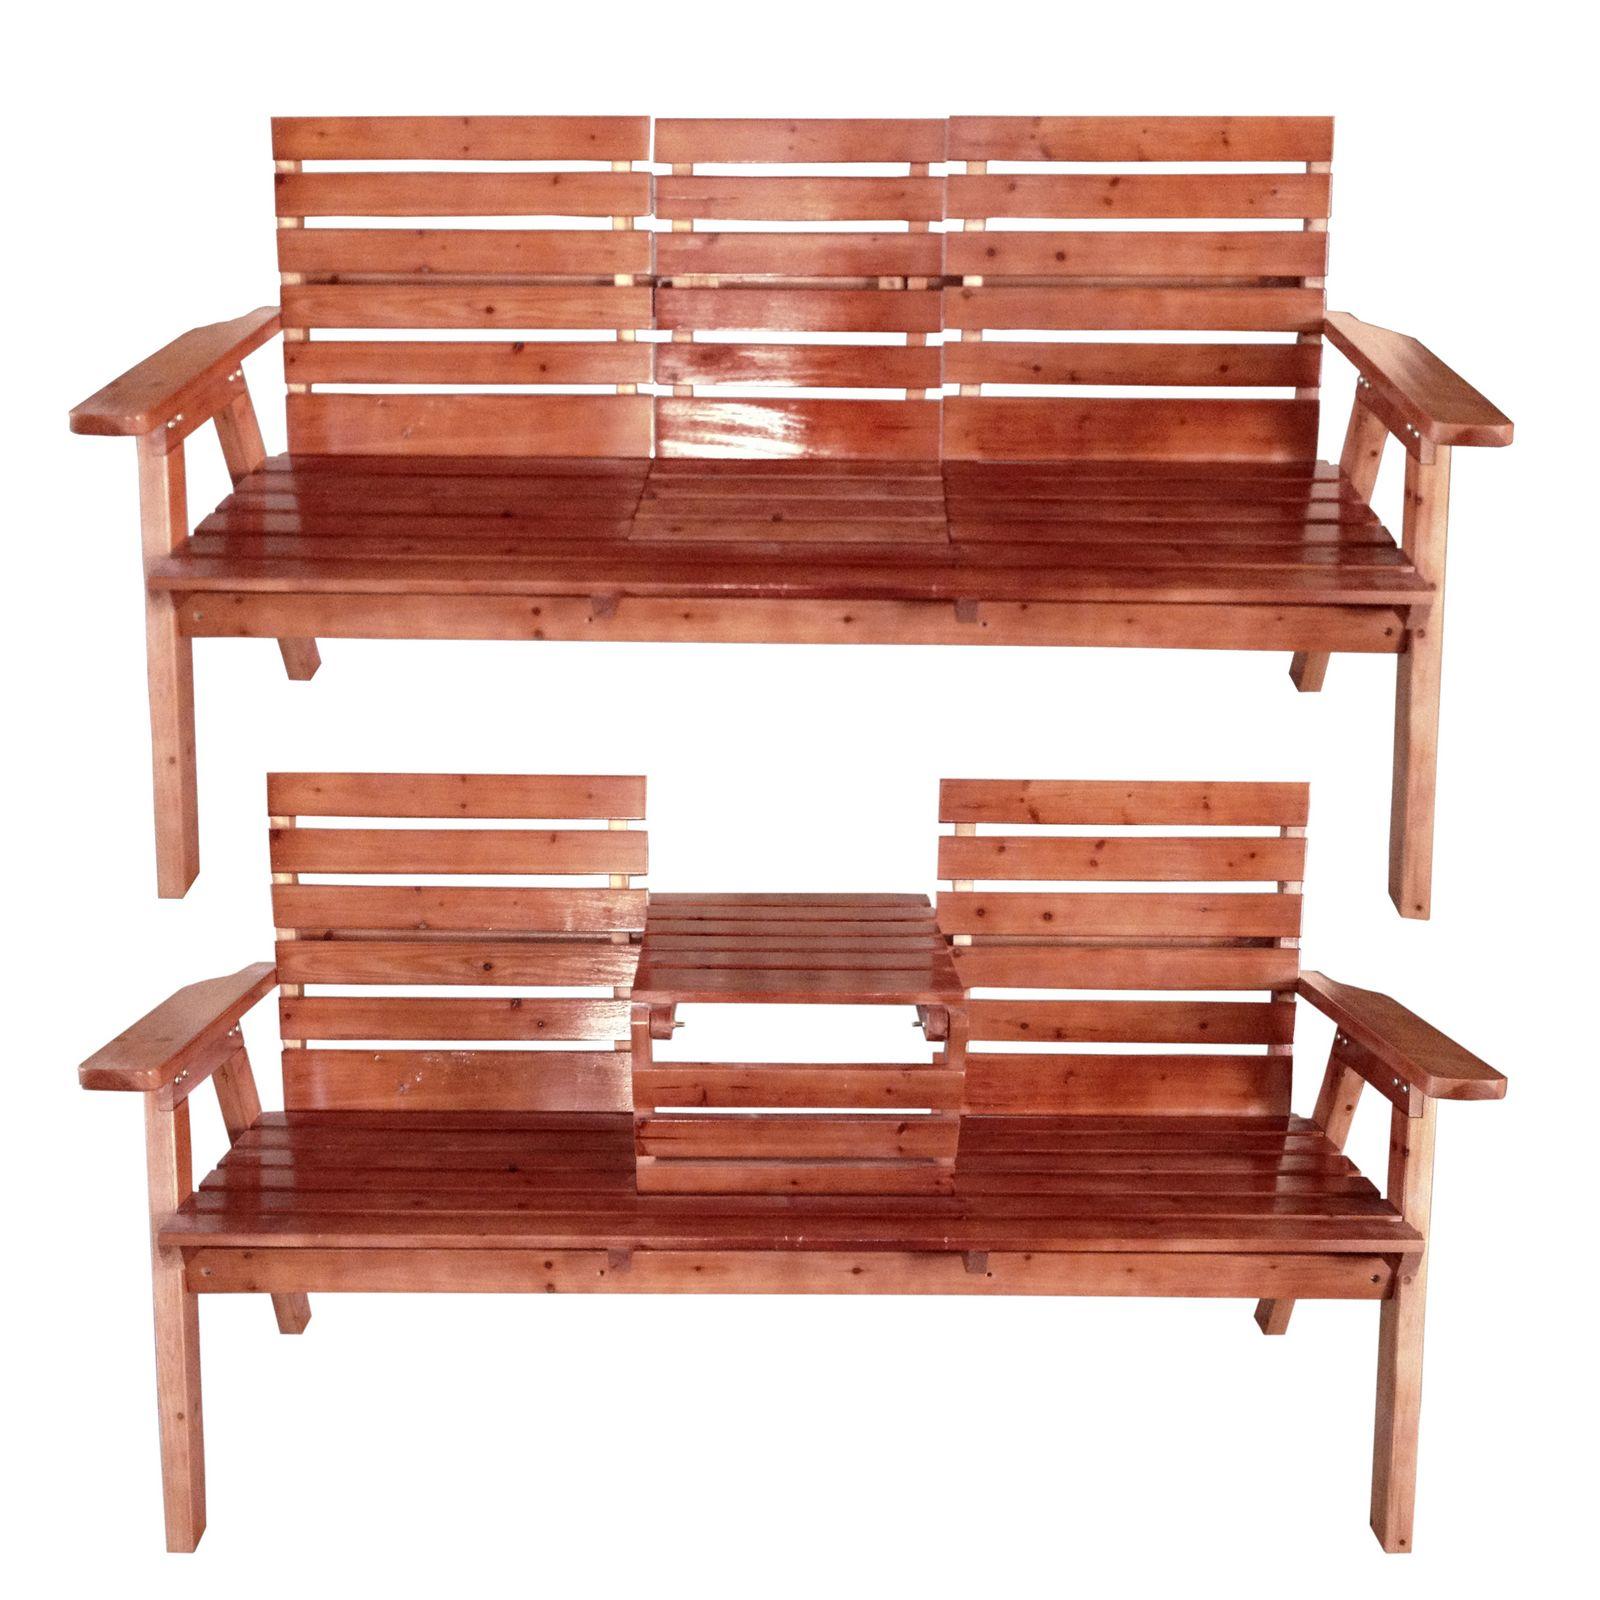 gartenbank picknick klappbarer tisch sitzbank holzbank 150230 eine interessante. Black Bedroom Furniture Sets. Home Design Ideas